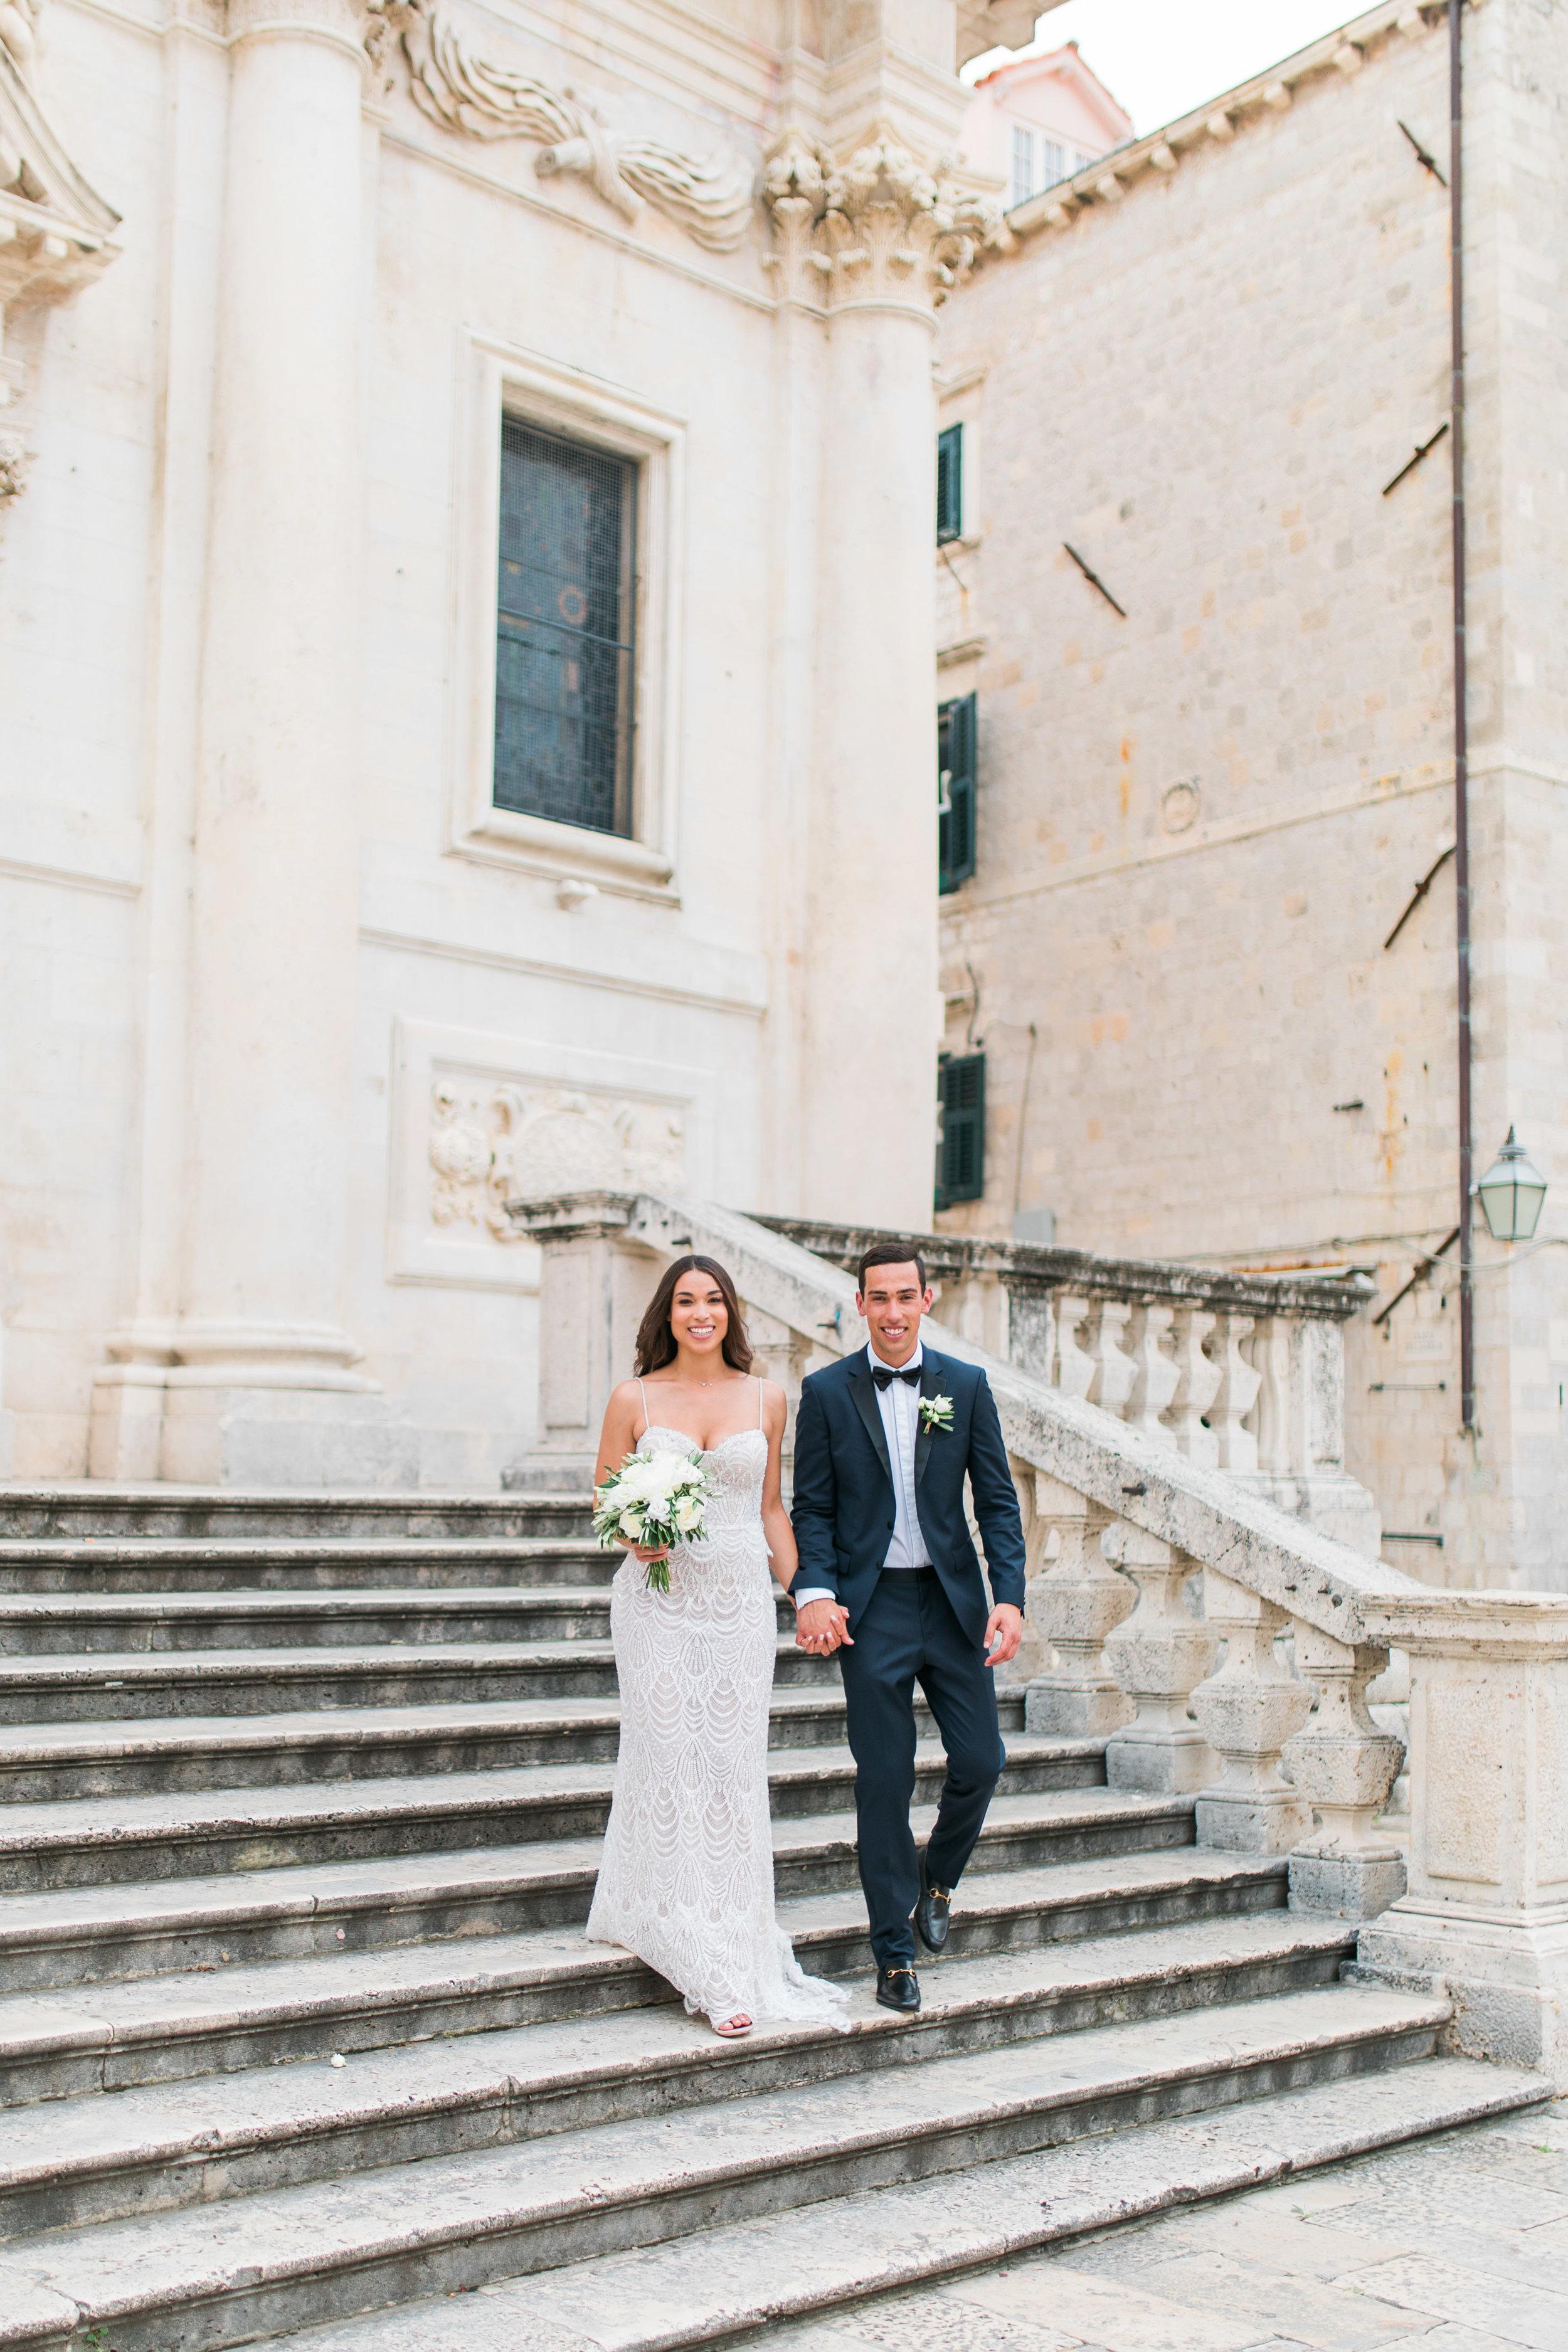 Dubrovnik-Wedding-Photographer-Croatia-Wedding-Photos-JBJ-Pictures-14.jpg